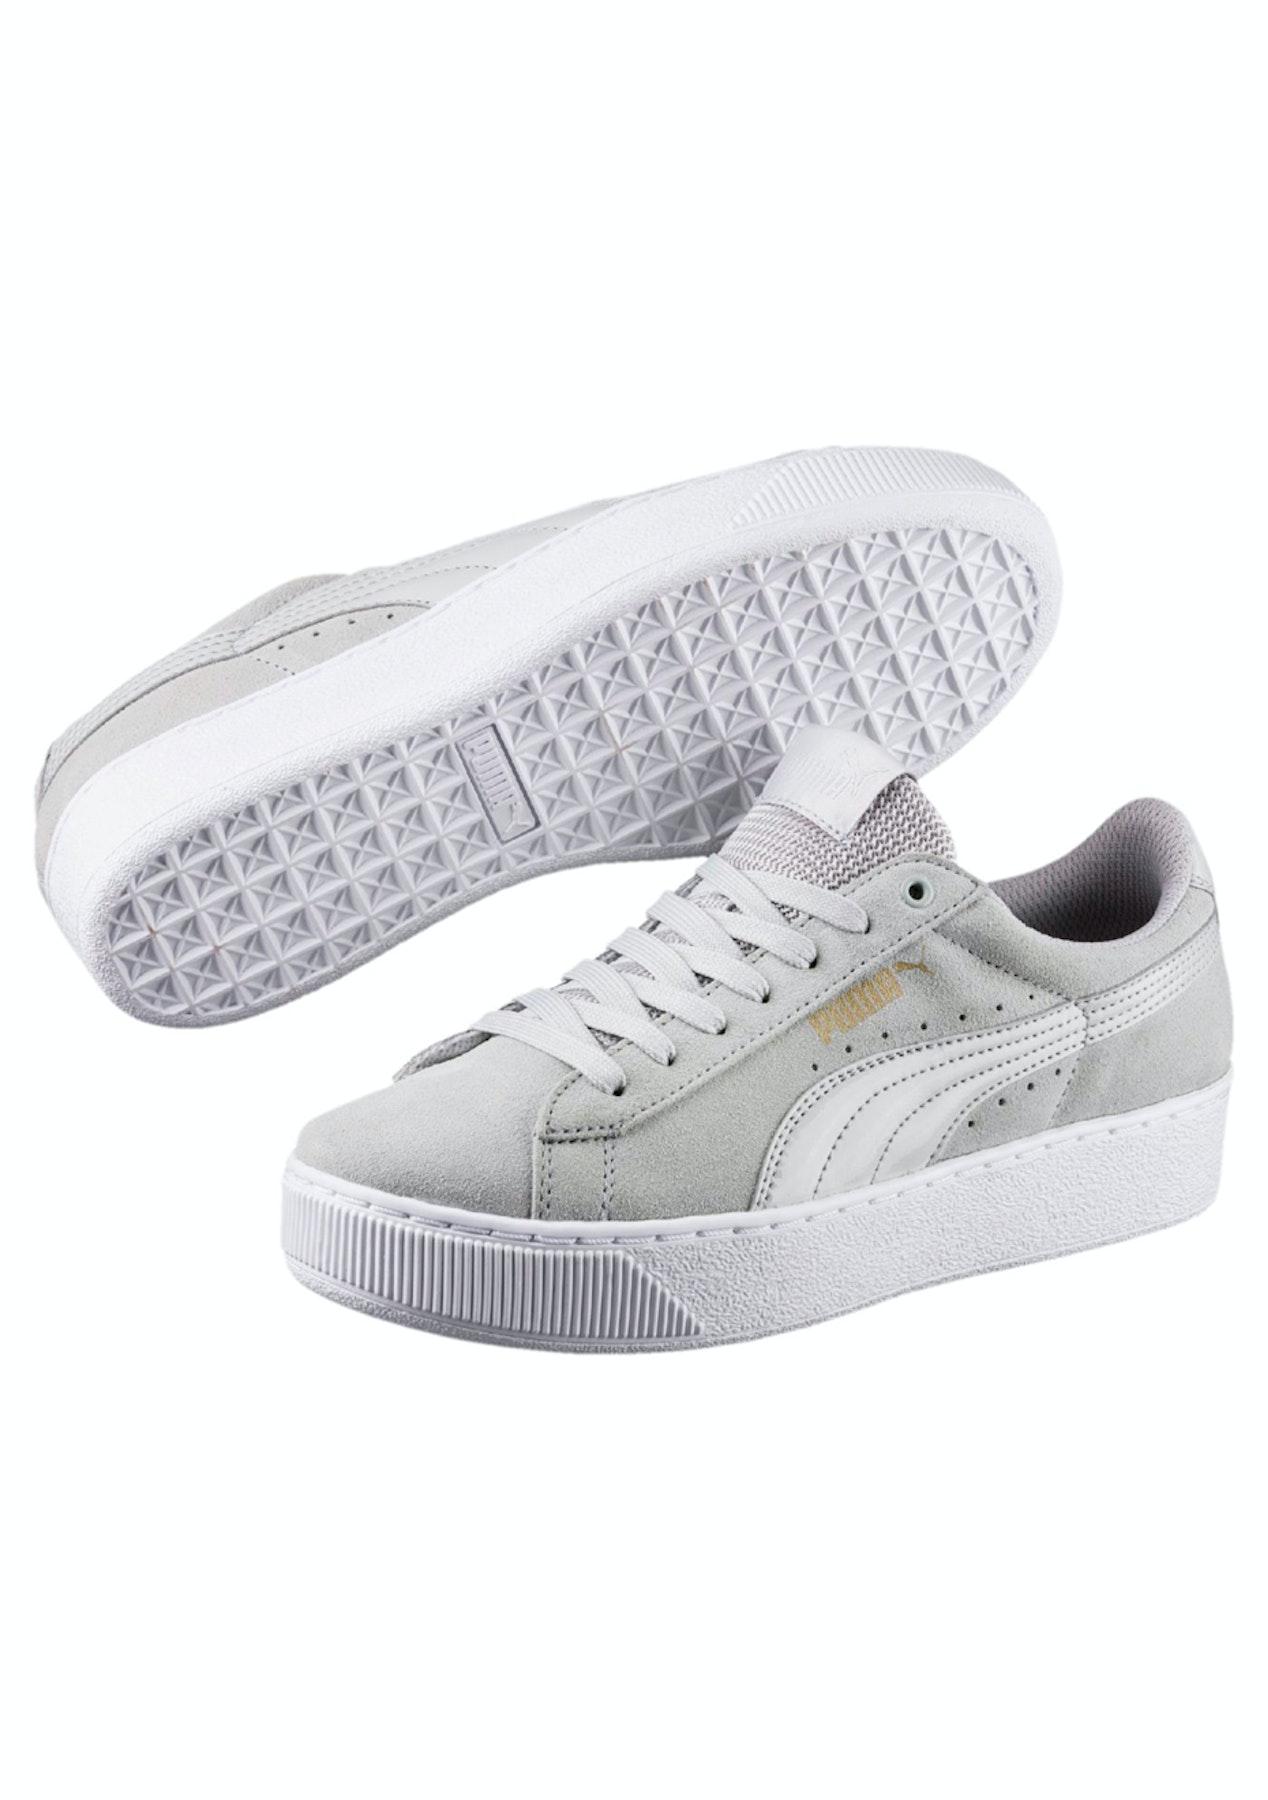 09199ca75a8 Puma Womens - Puma Vikky Platform - Grey Violet - Shoe Garage Sale - Onceit